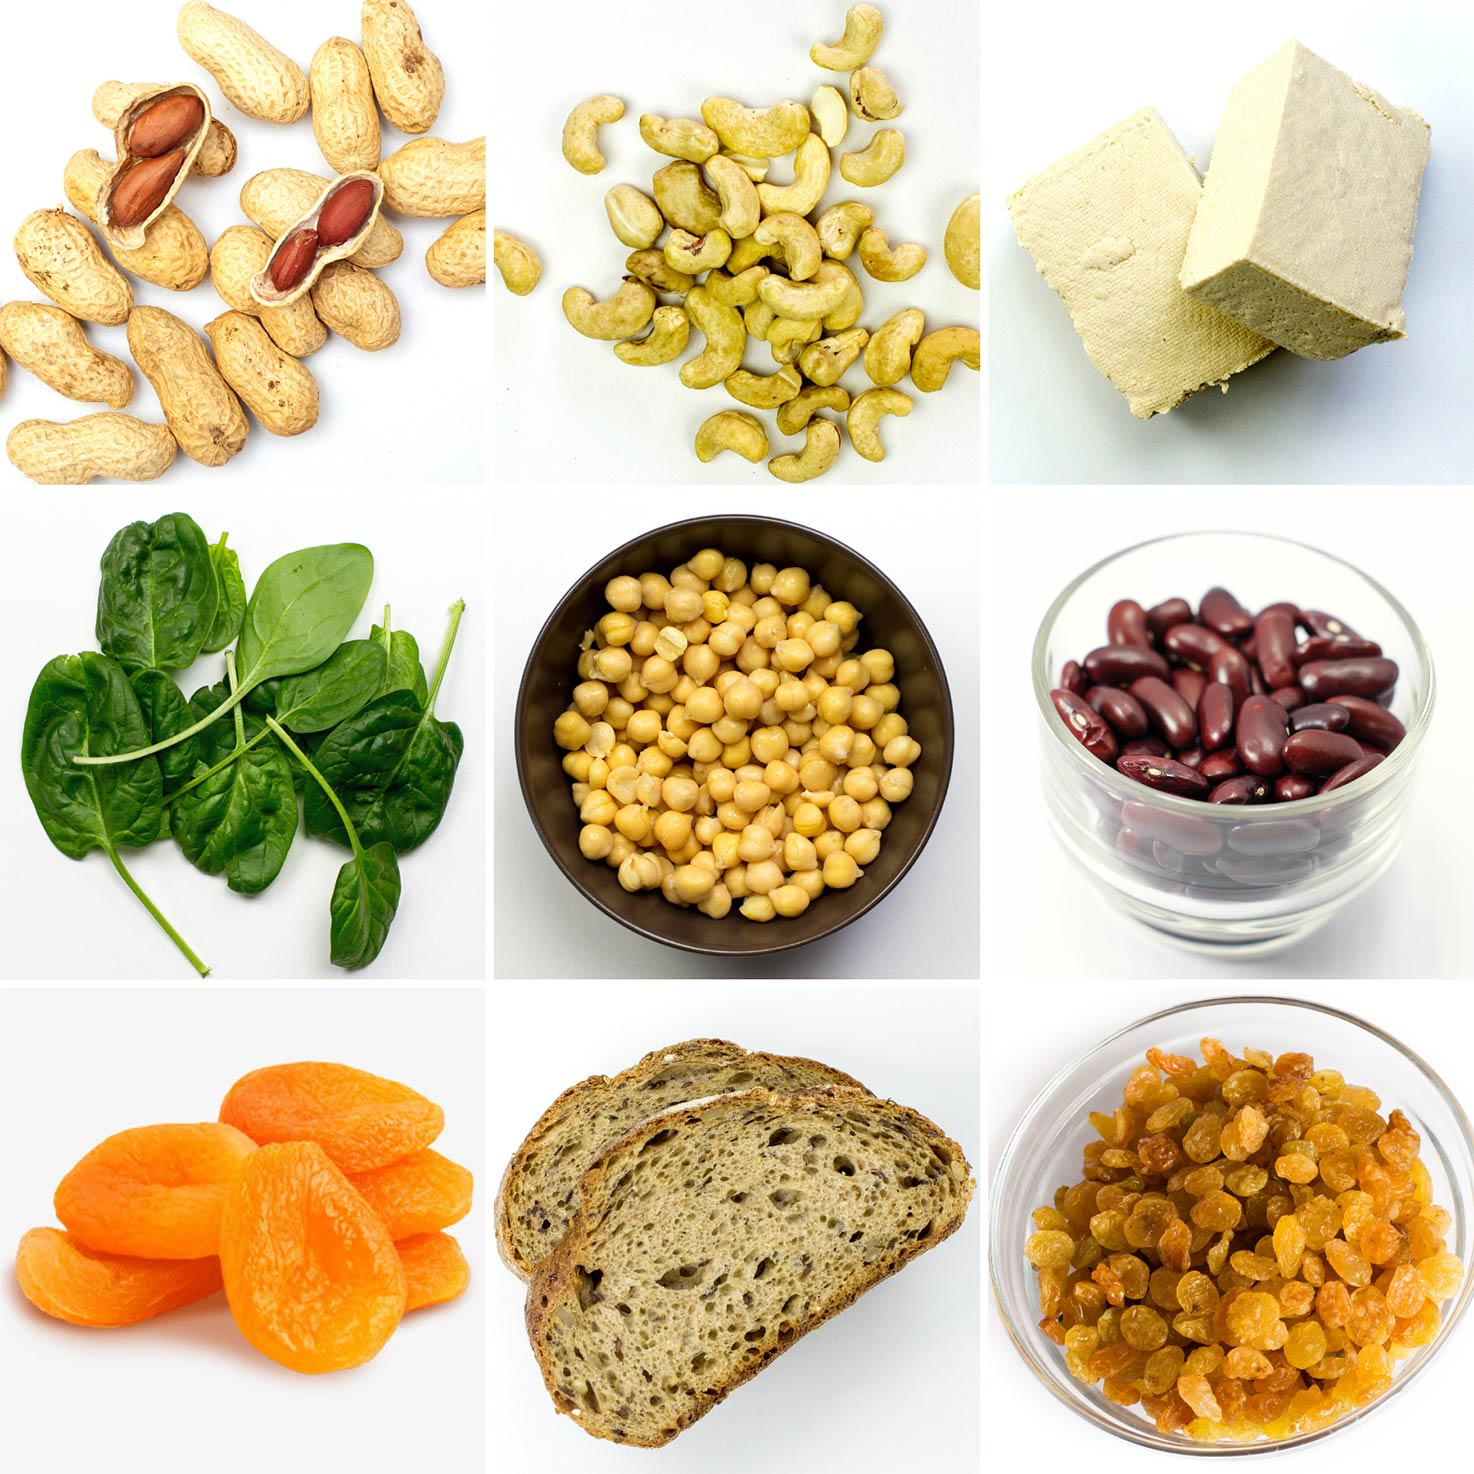 Vegetarian sources of Iron: chickpeas, kidney beans, peanuts, tofu, raisins, bread | hurrythefoodup.com